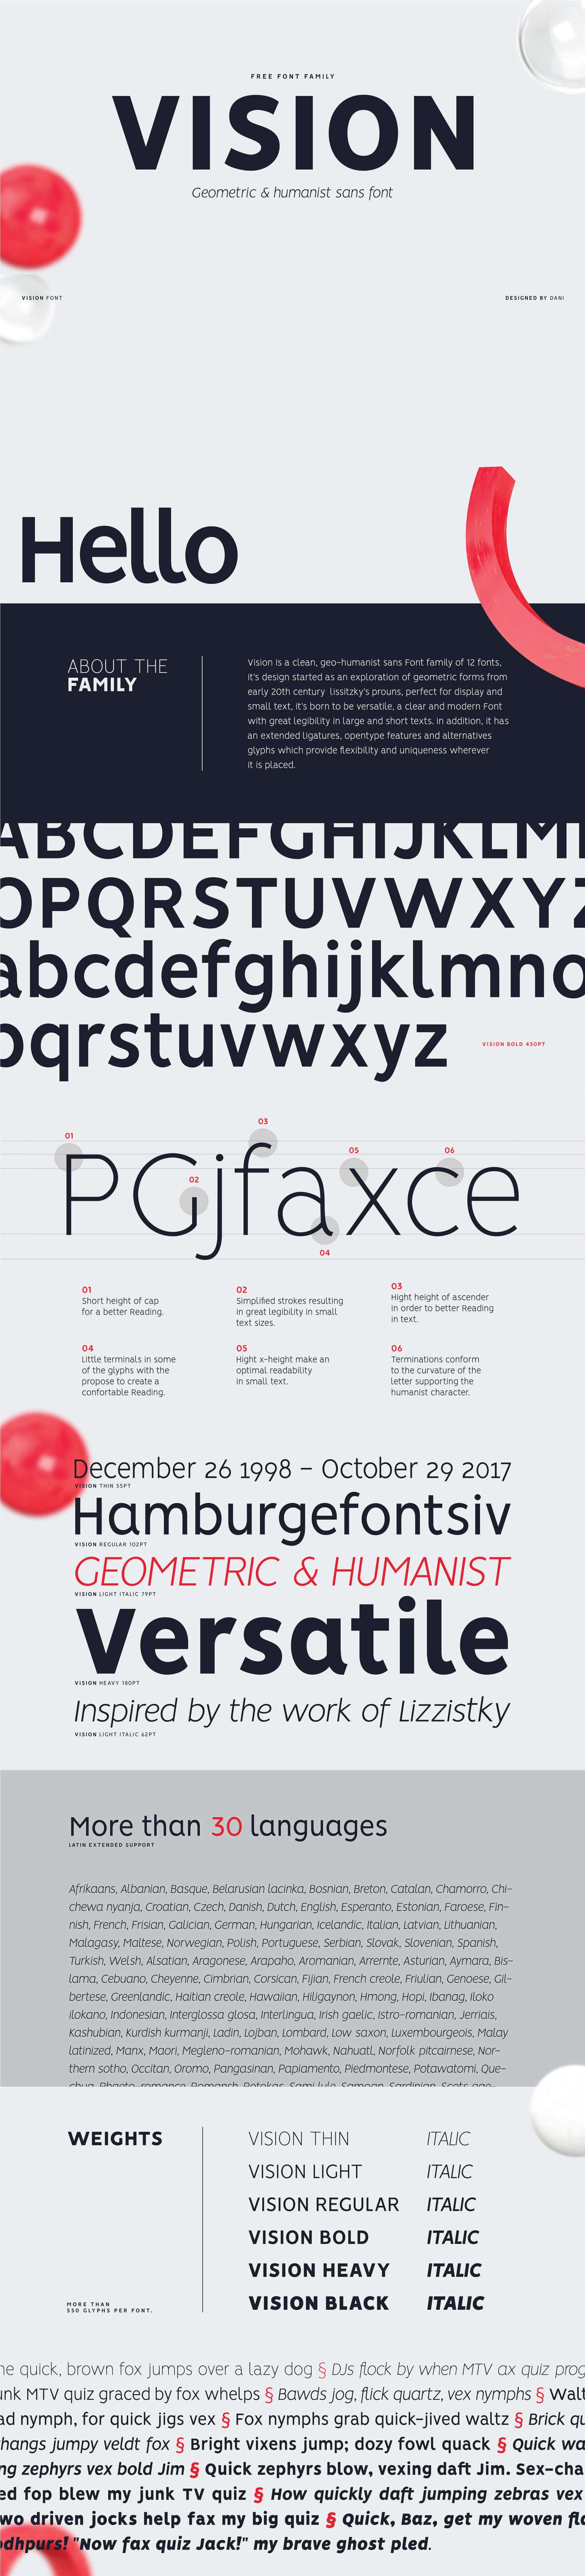 VISION - Free Font Family (12 FONTS) — fontsrepo